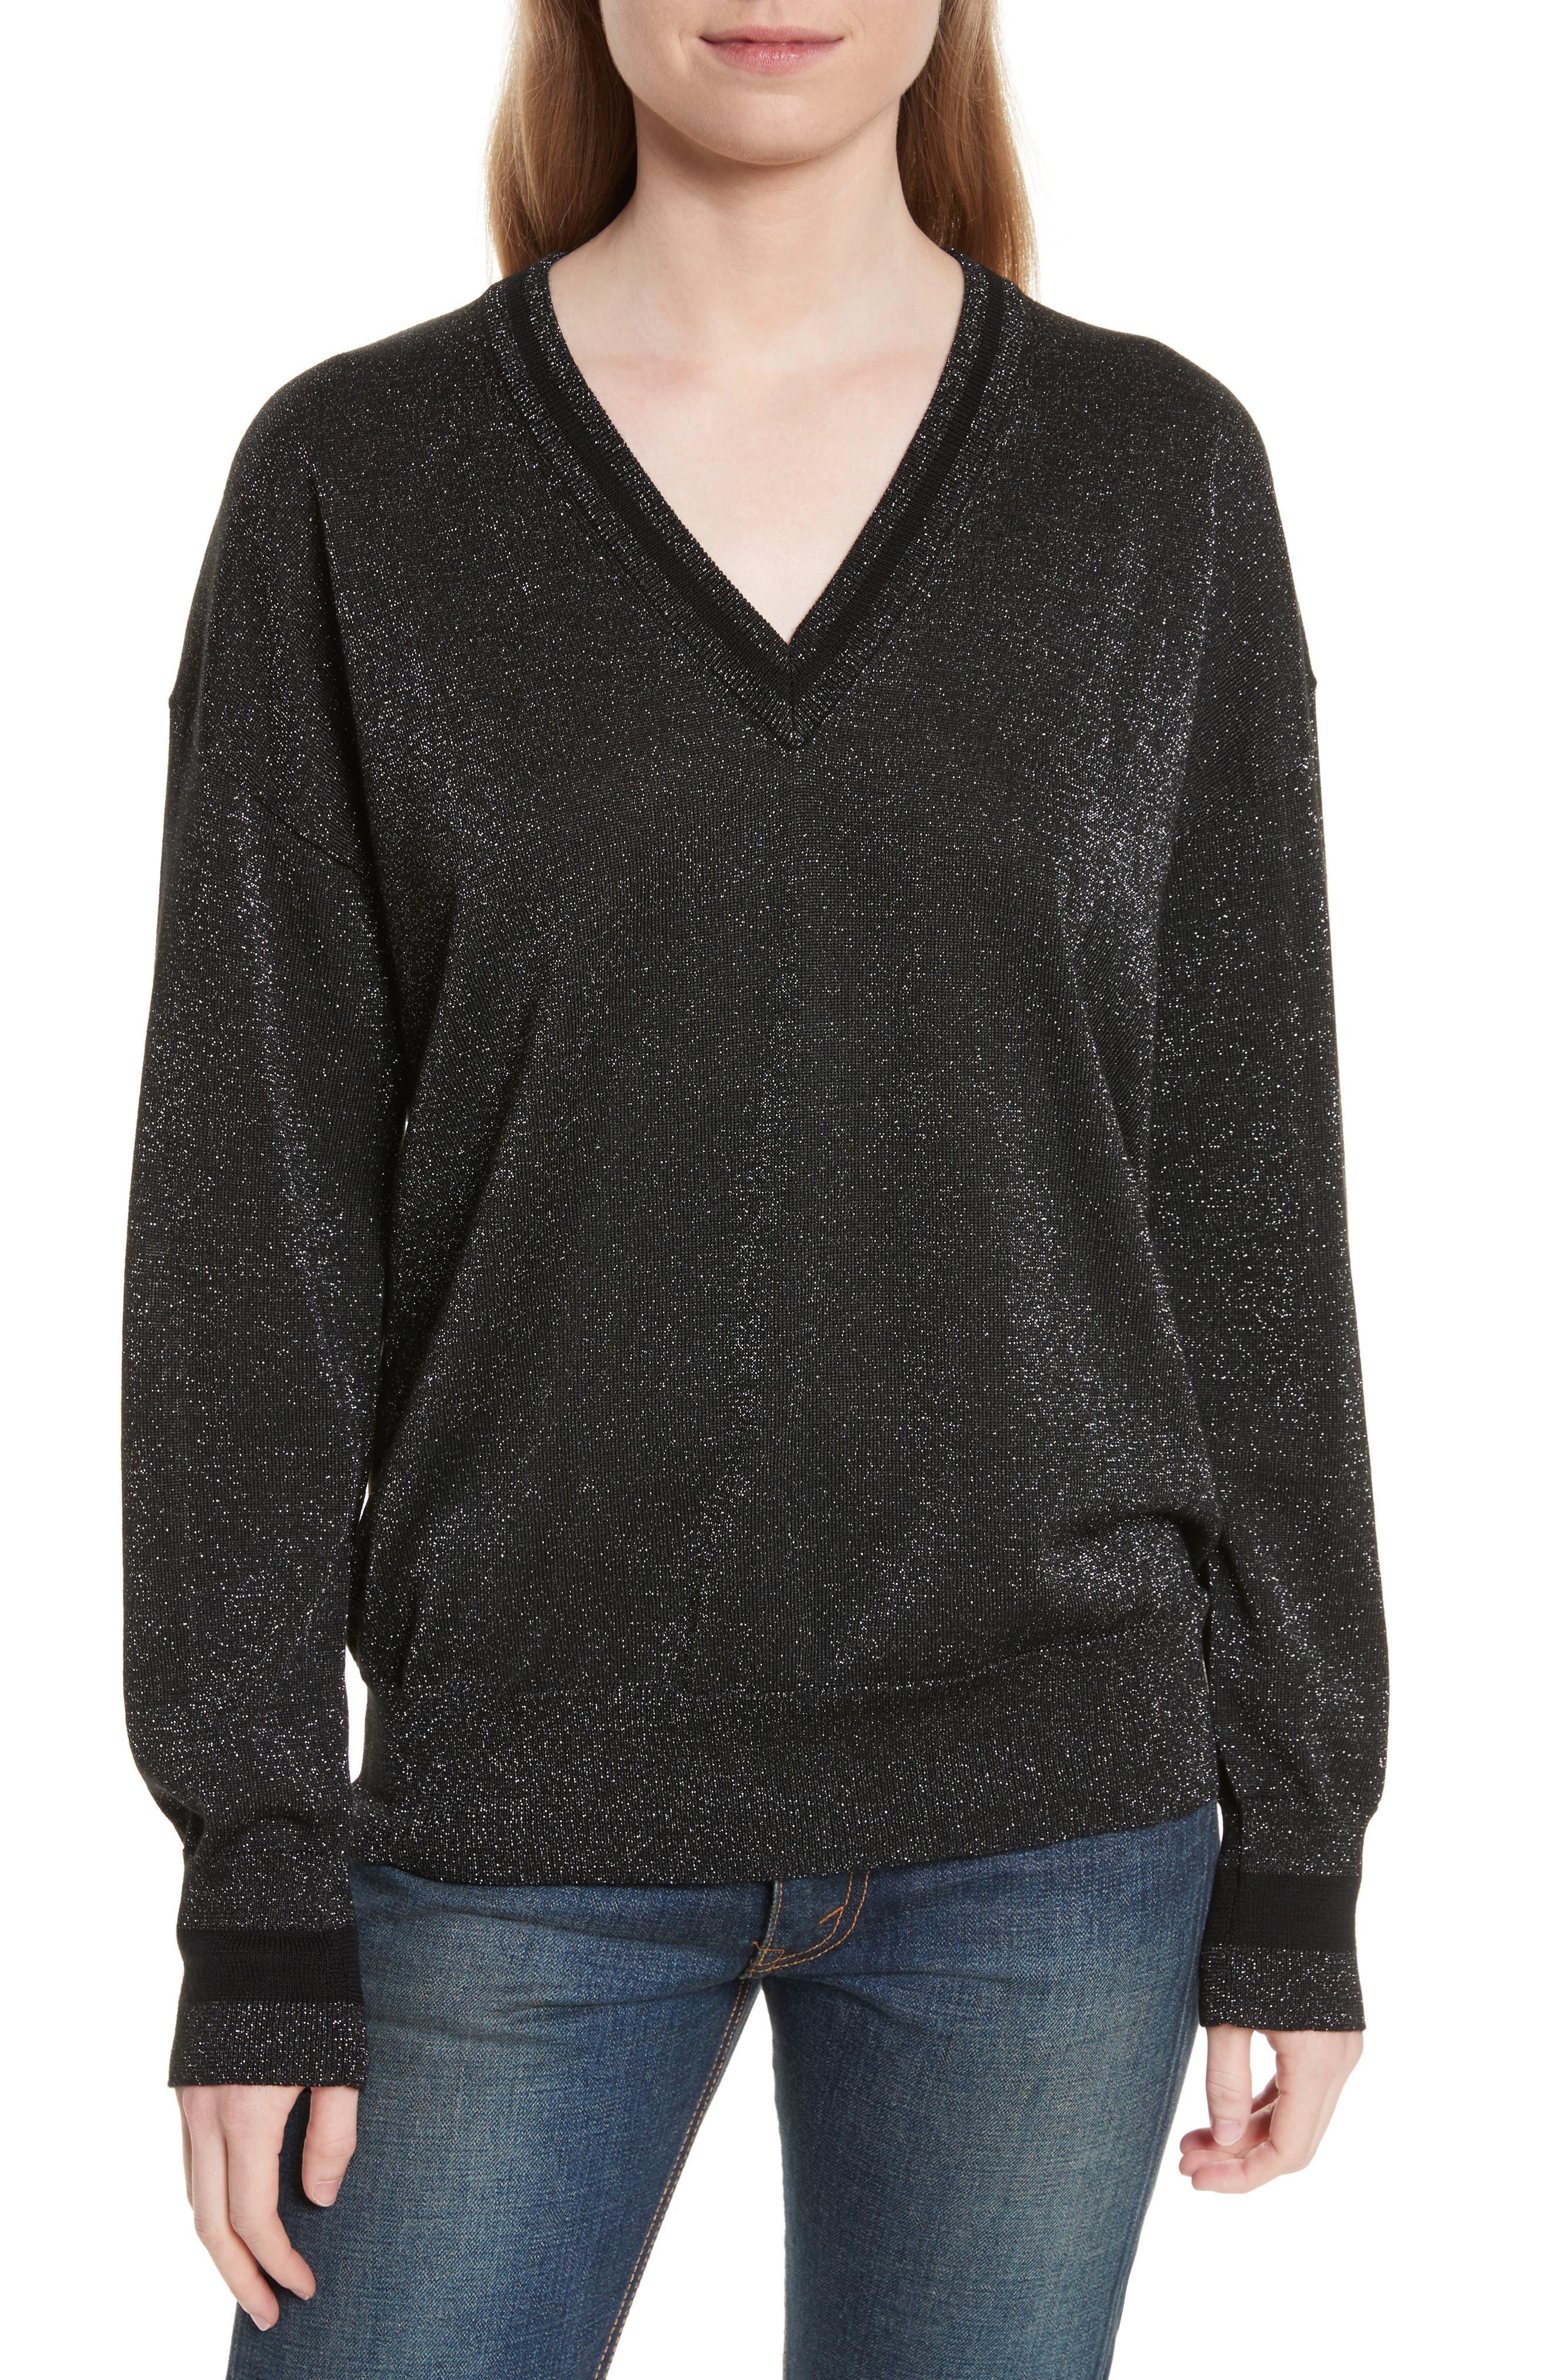 Lucinda V-Neck Sweater,                         Main,                         color, Black/ Gunmetal Lurex